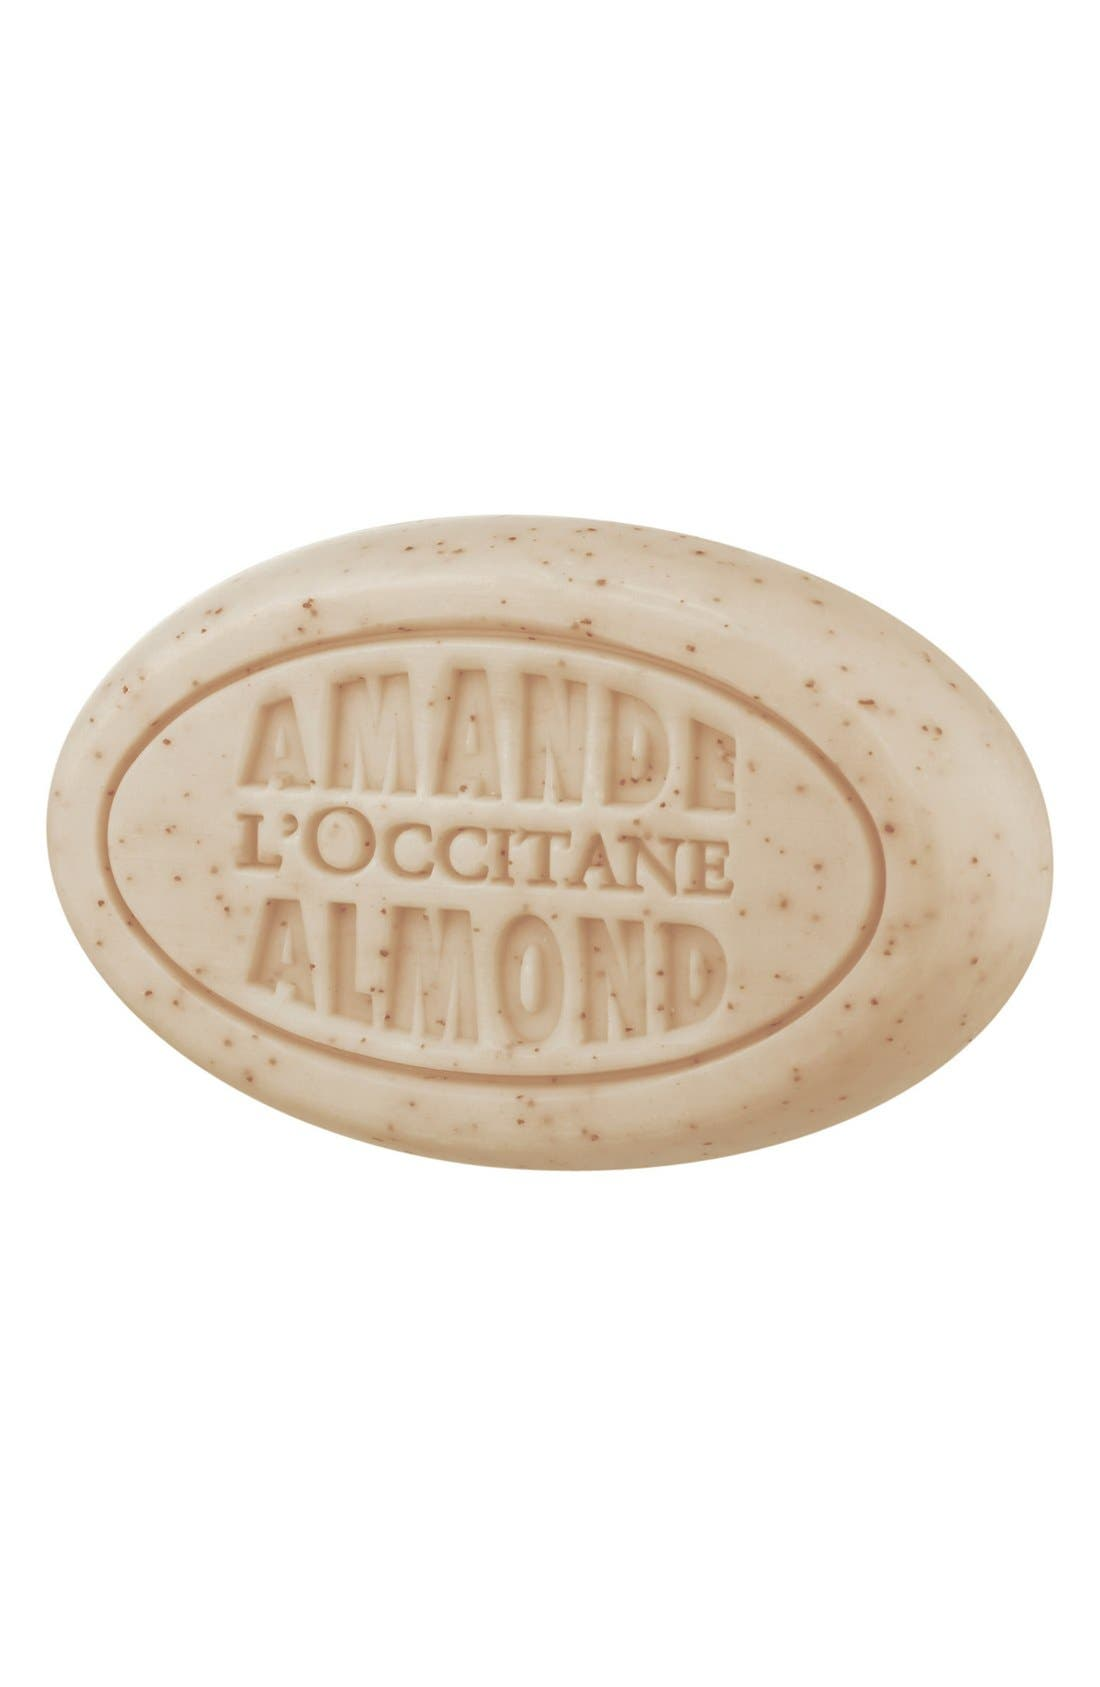 'Almond Delicious' Soap,                         Main,                         color, NO COLOR